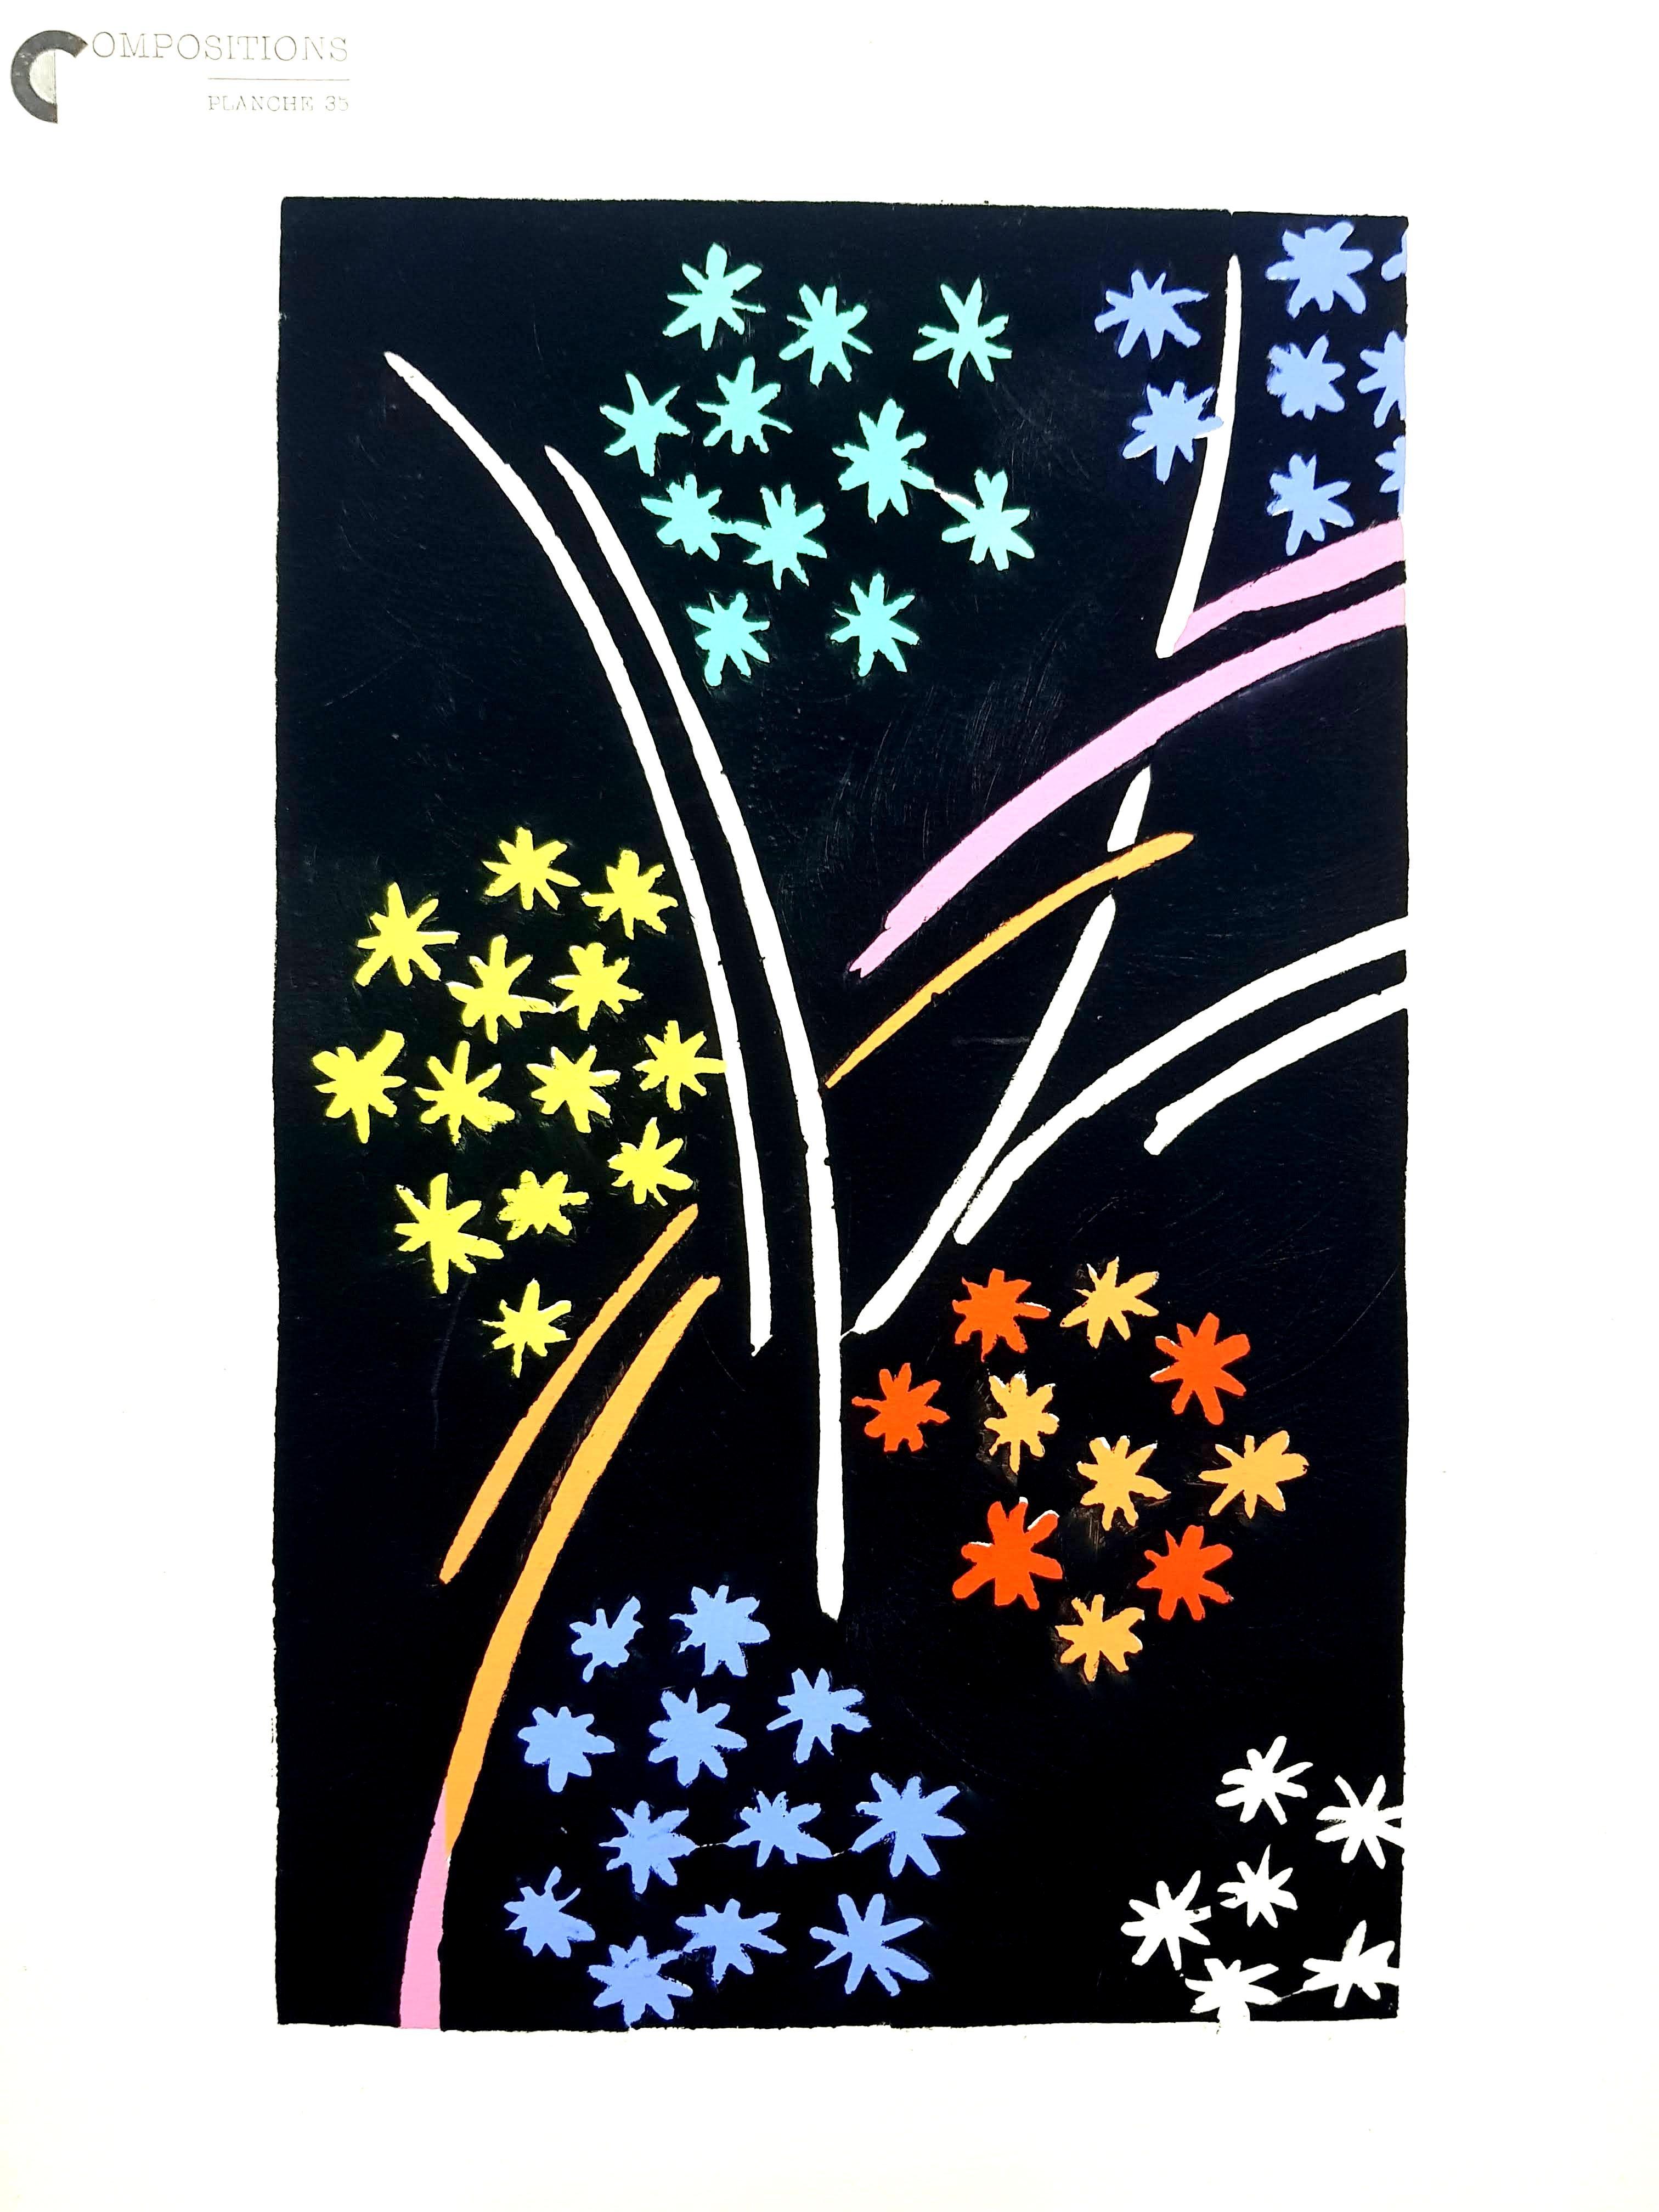 After Delaunay - Color Compositions - Pochoir